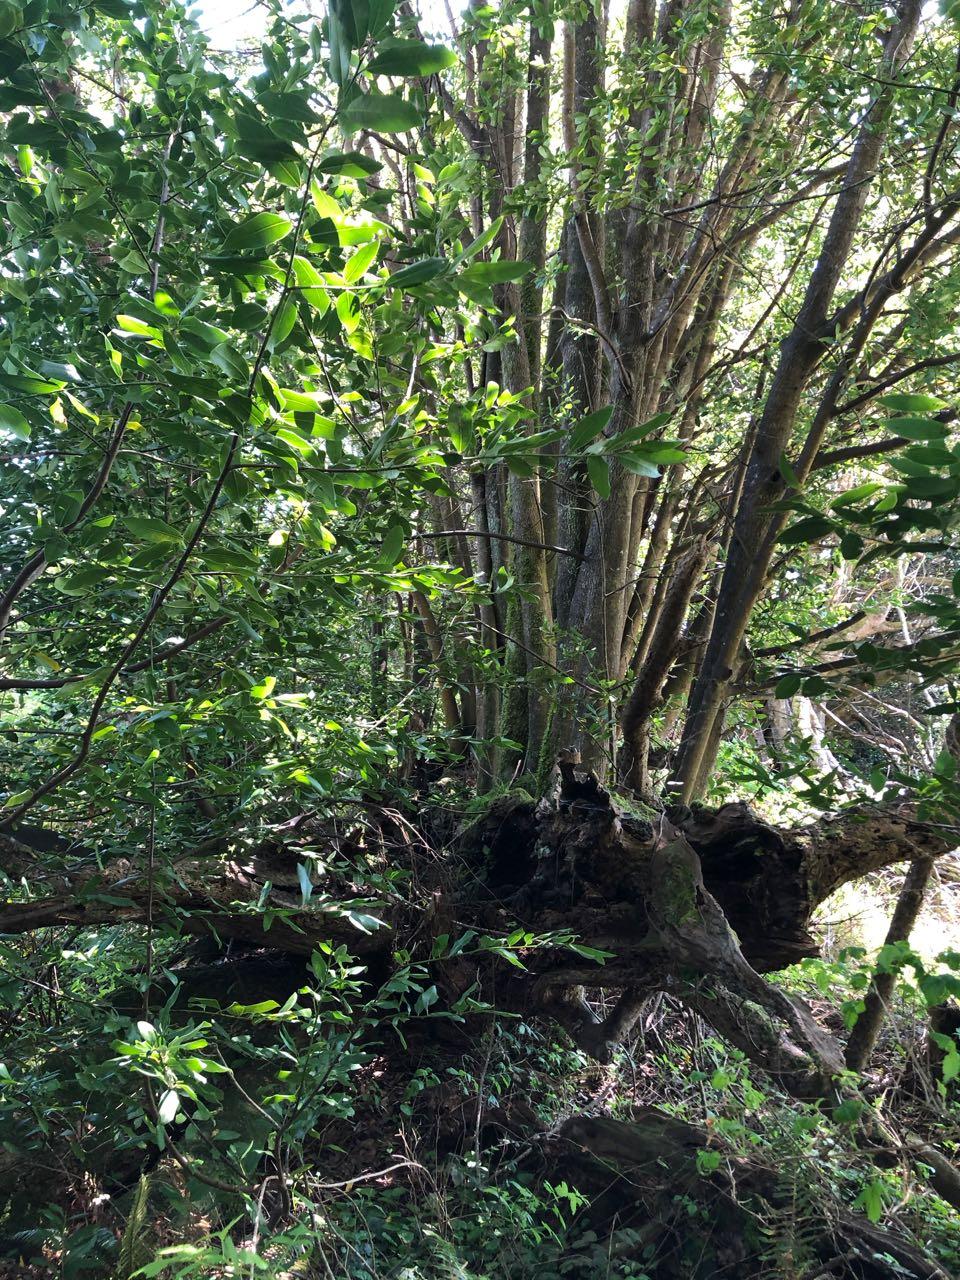 myrtlewood clump growing on nurse log